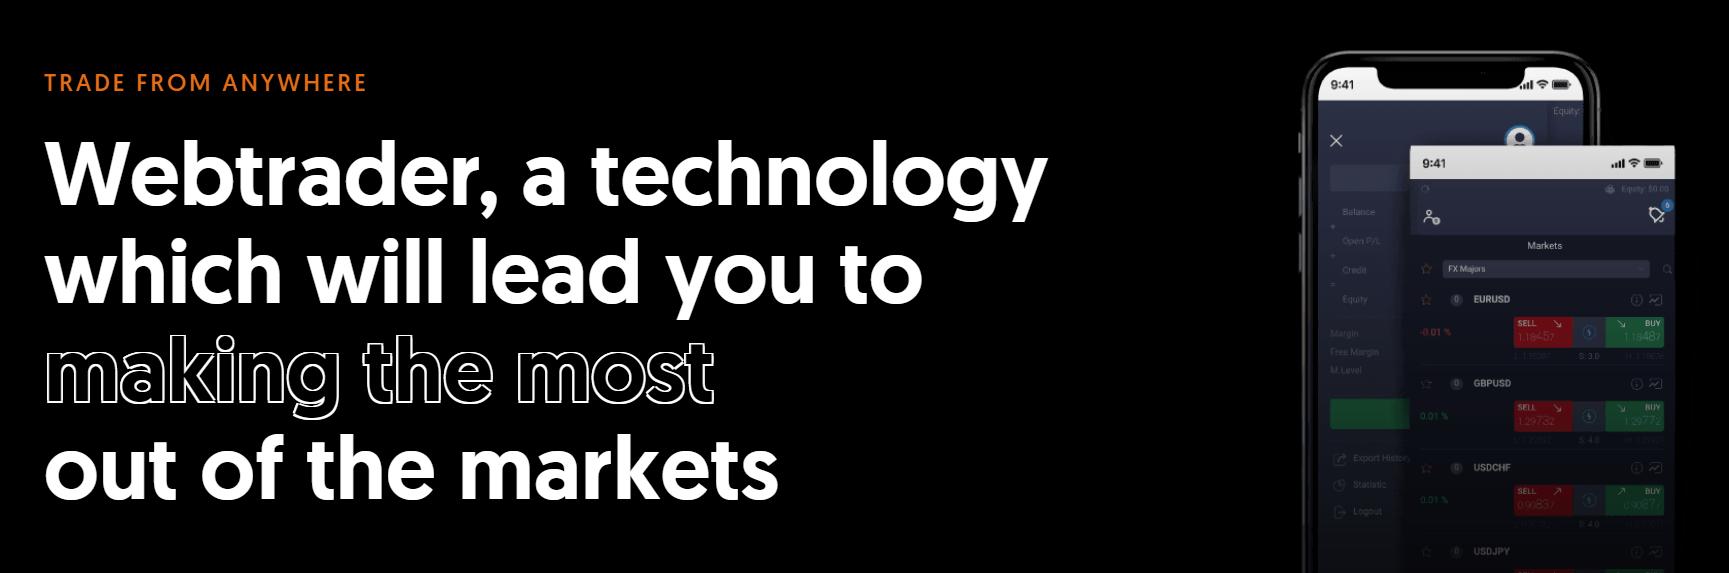 Global Solution mobile trading